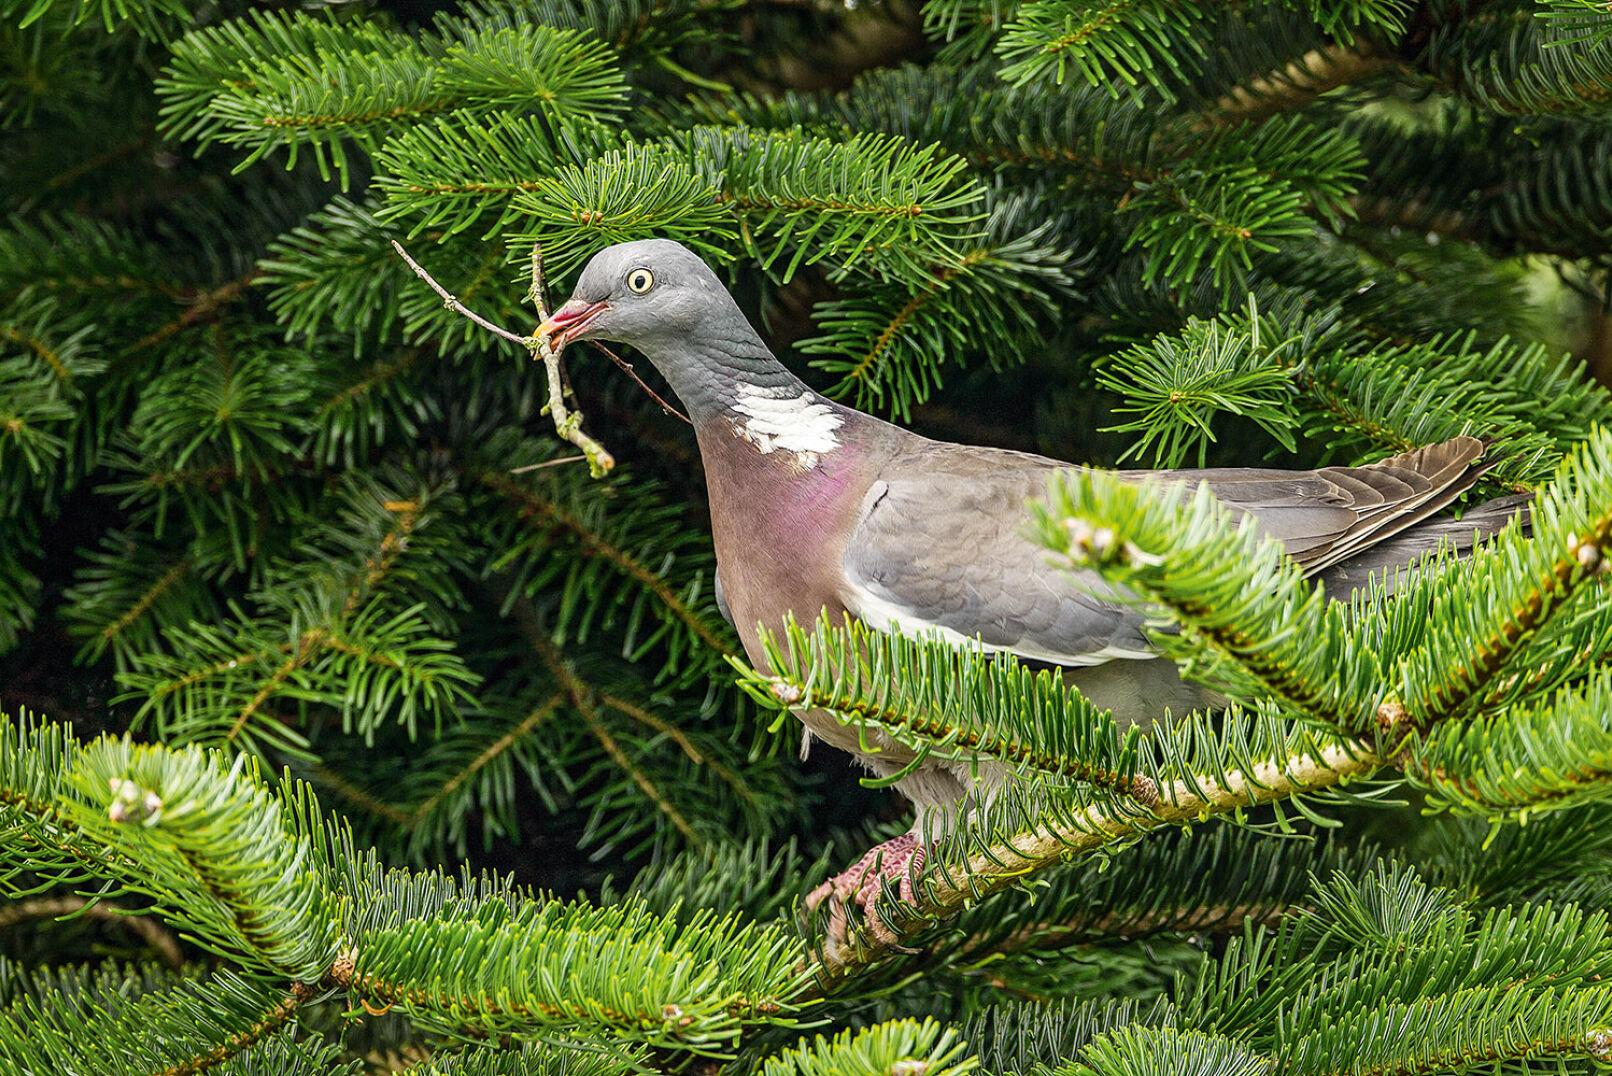 Ringeltaube– Altvogel mit Nistmaterial - Foto Helge Schulz - © Helge Schulz